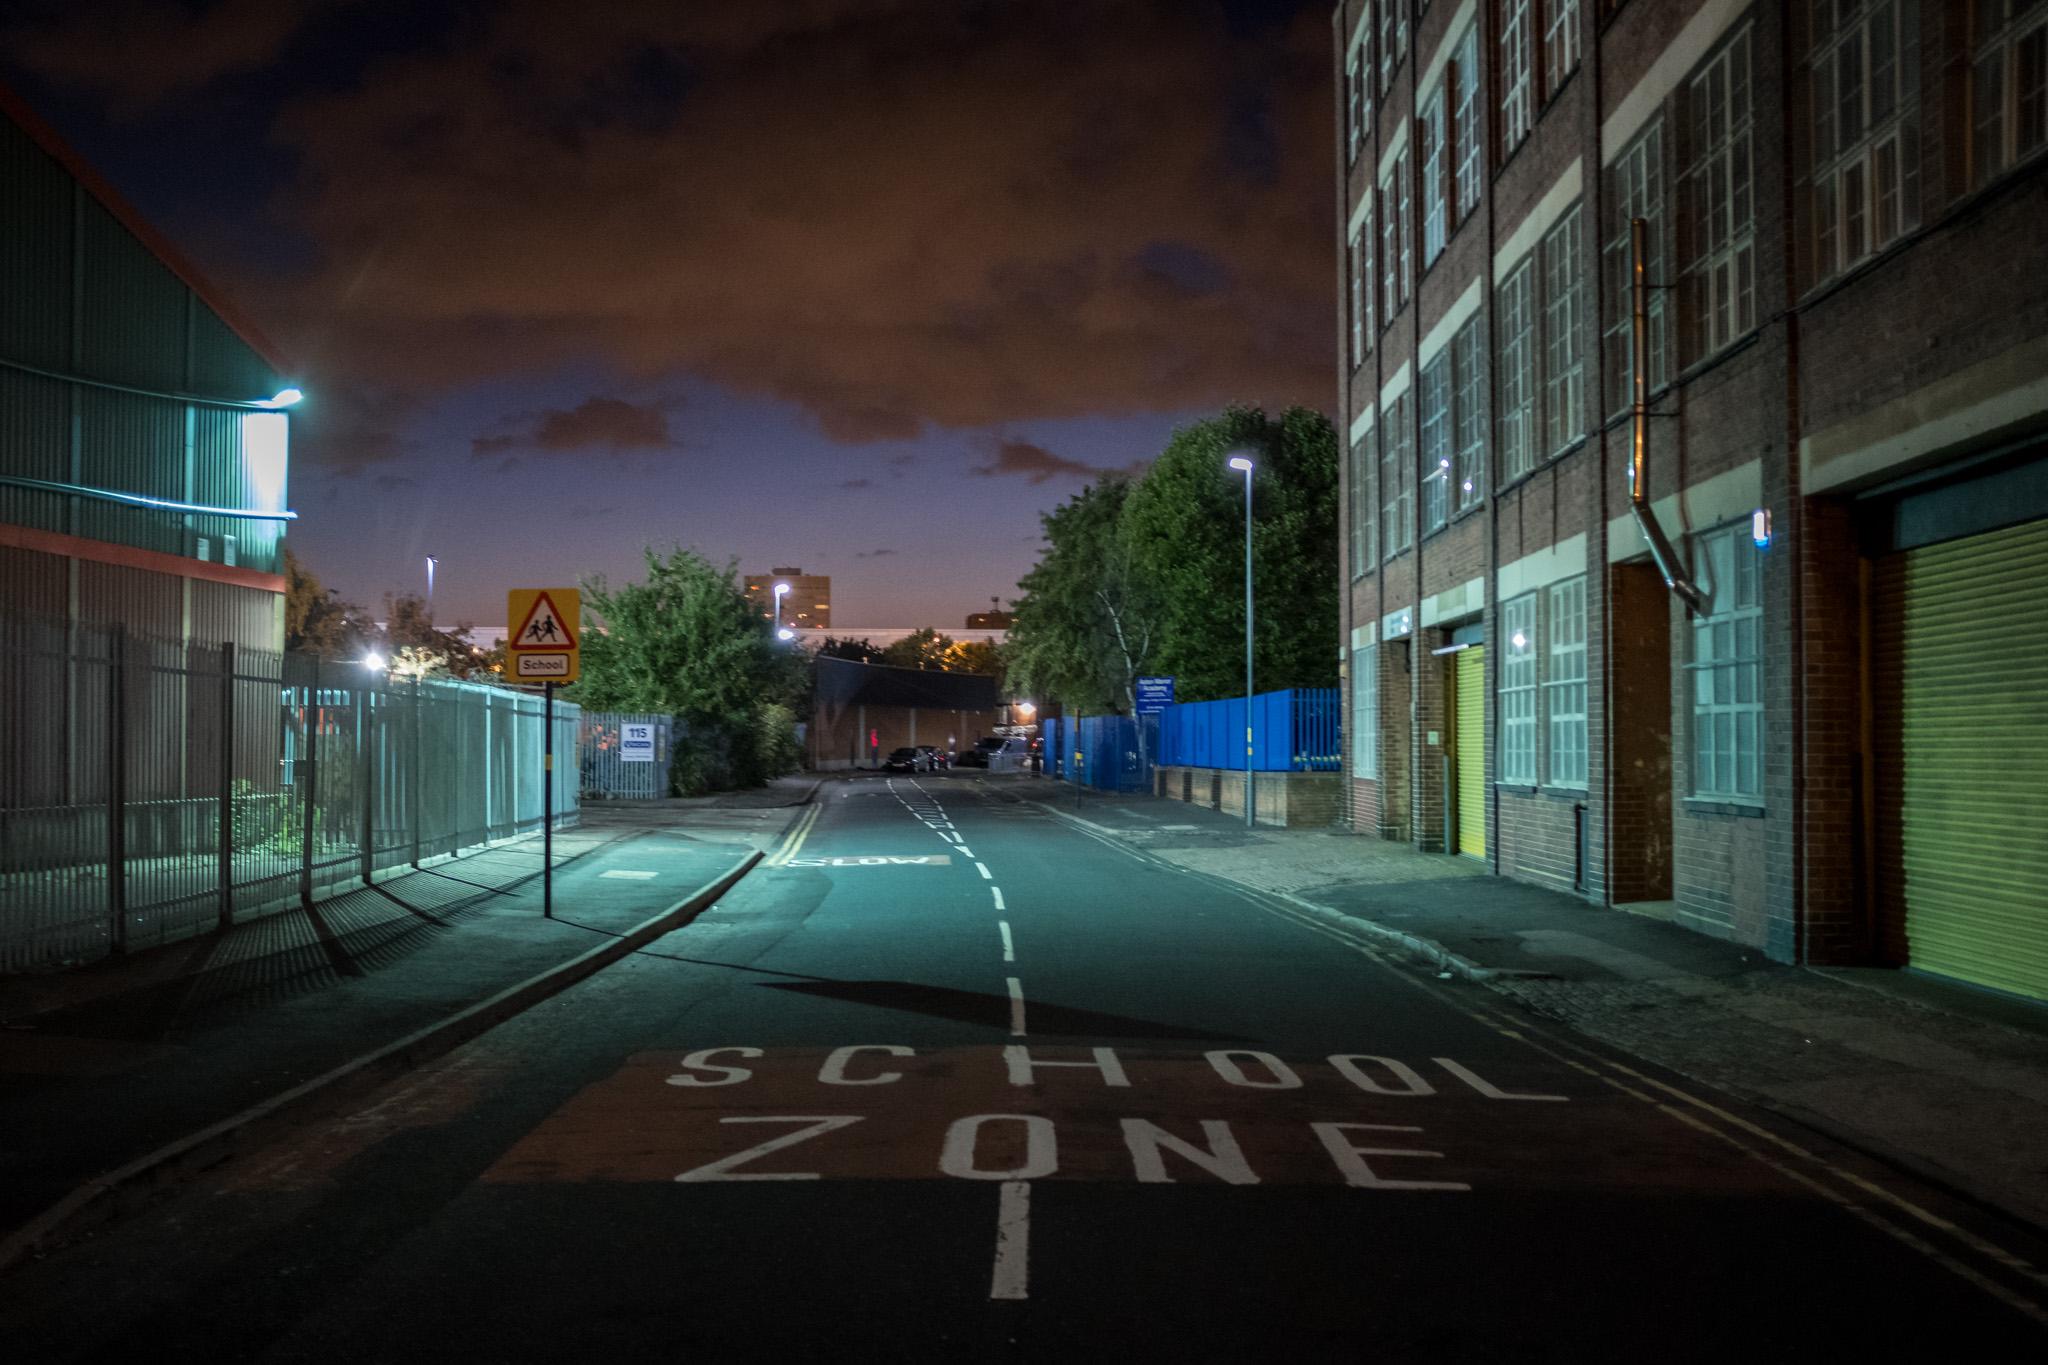 Ross Jukes Photography Birmingham-5171.jpg